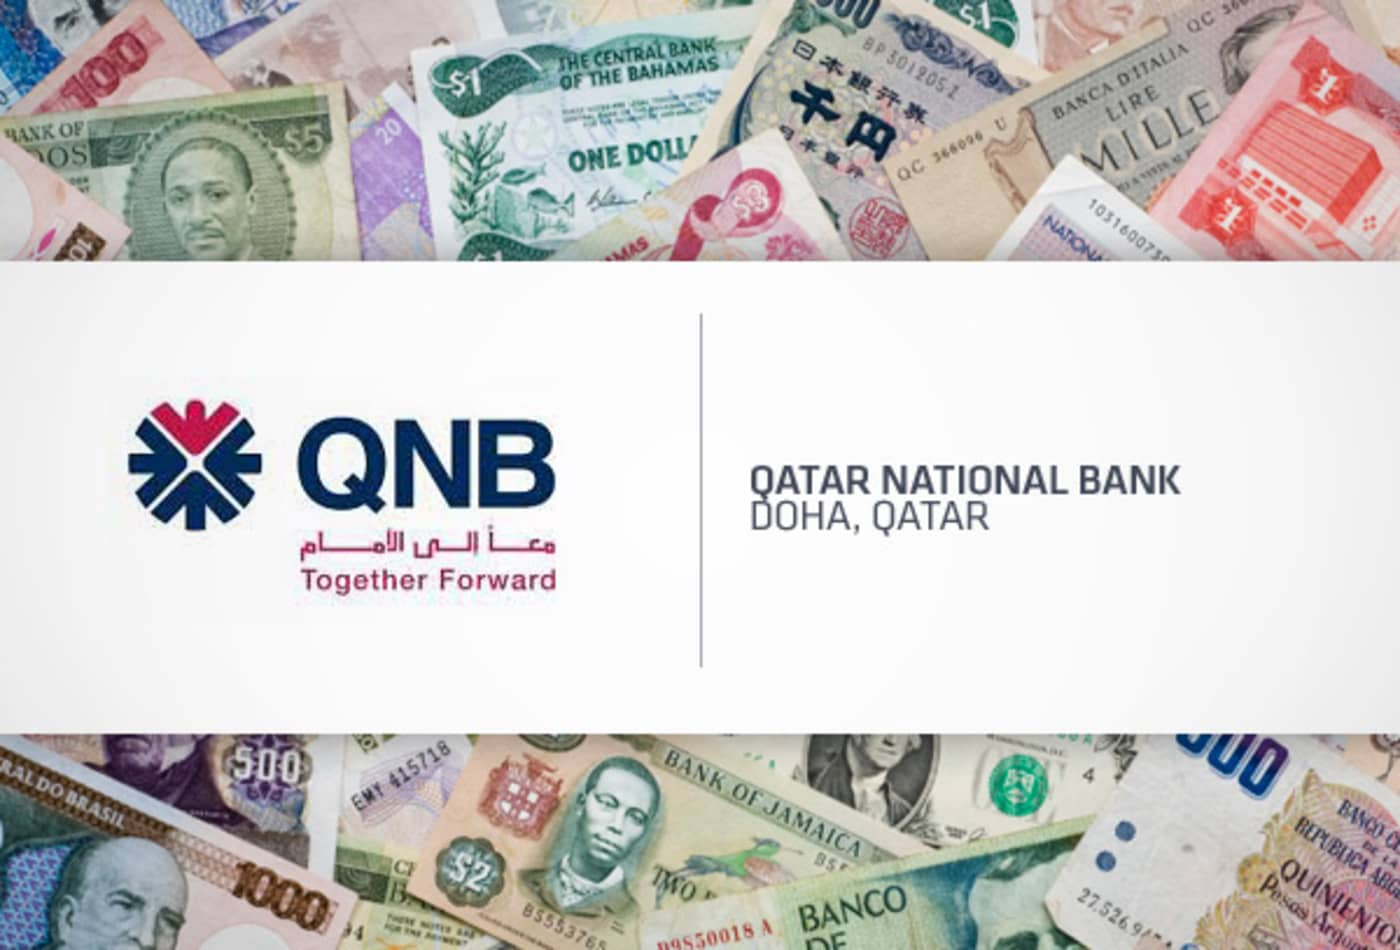 48679704 SS-Safest-Banks-qatar-national-bank-qatar-12.jpg